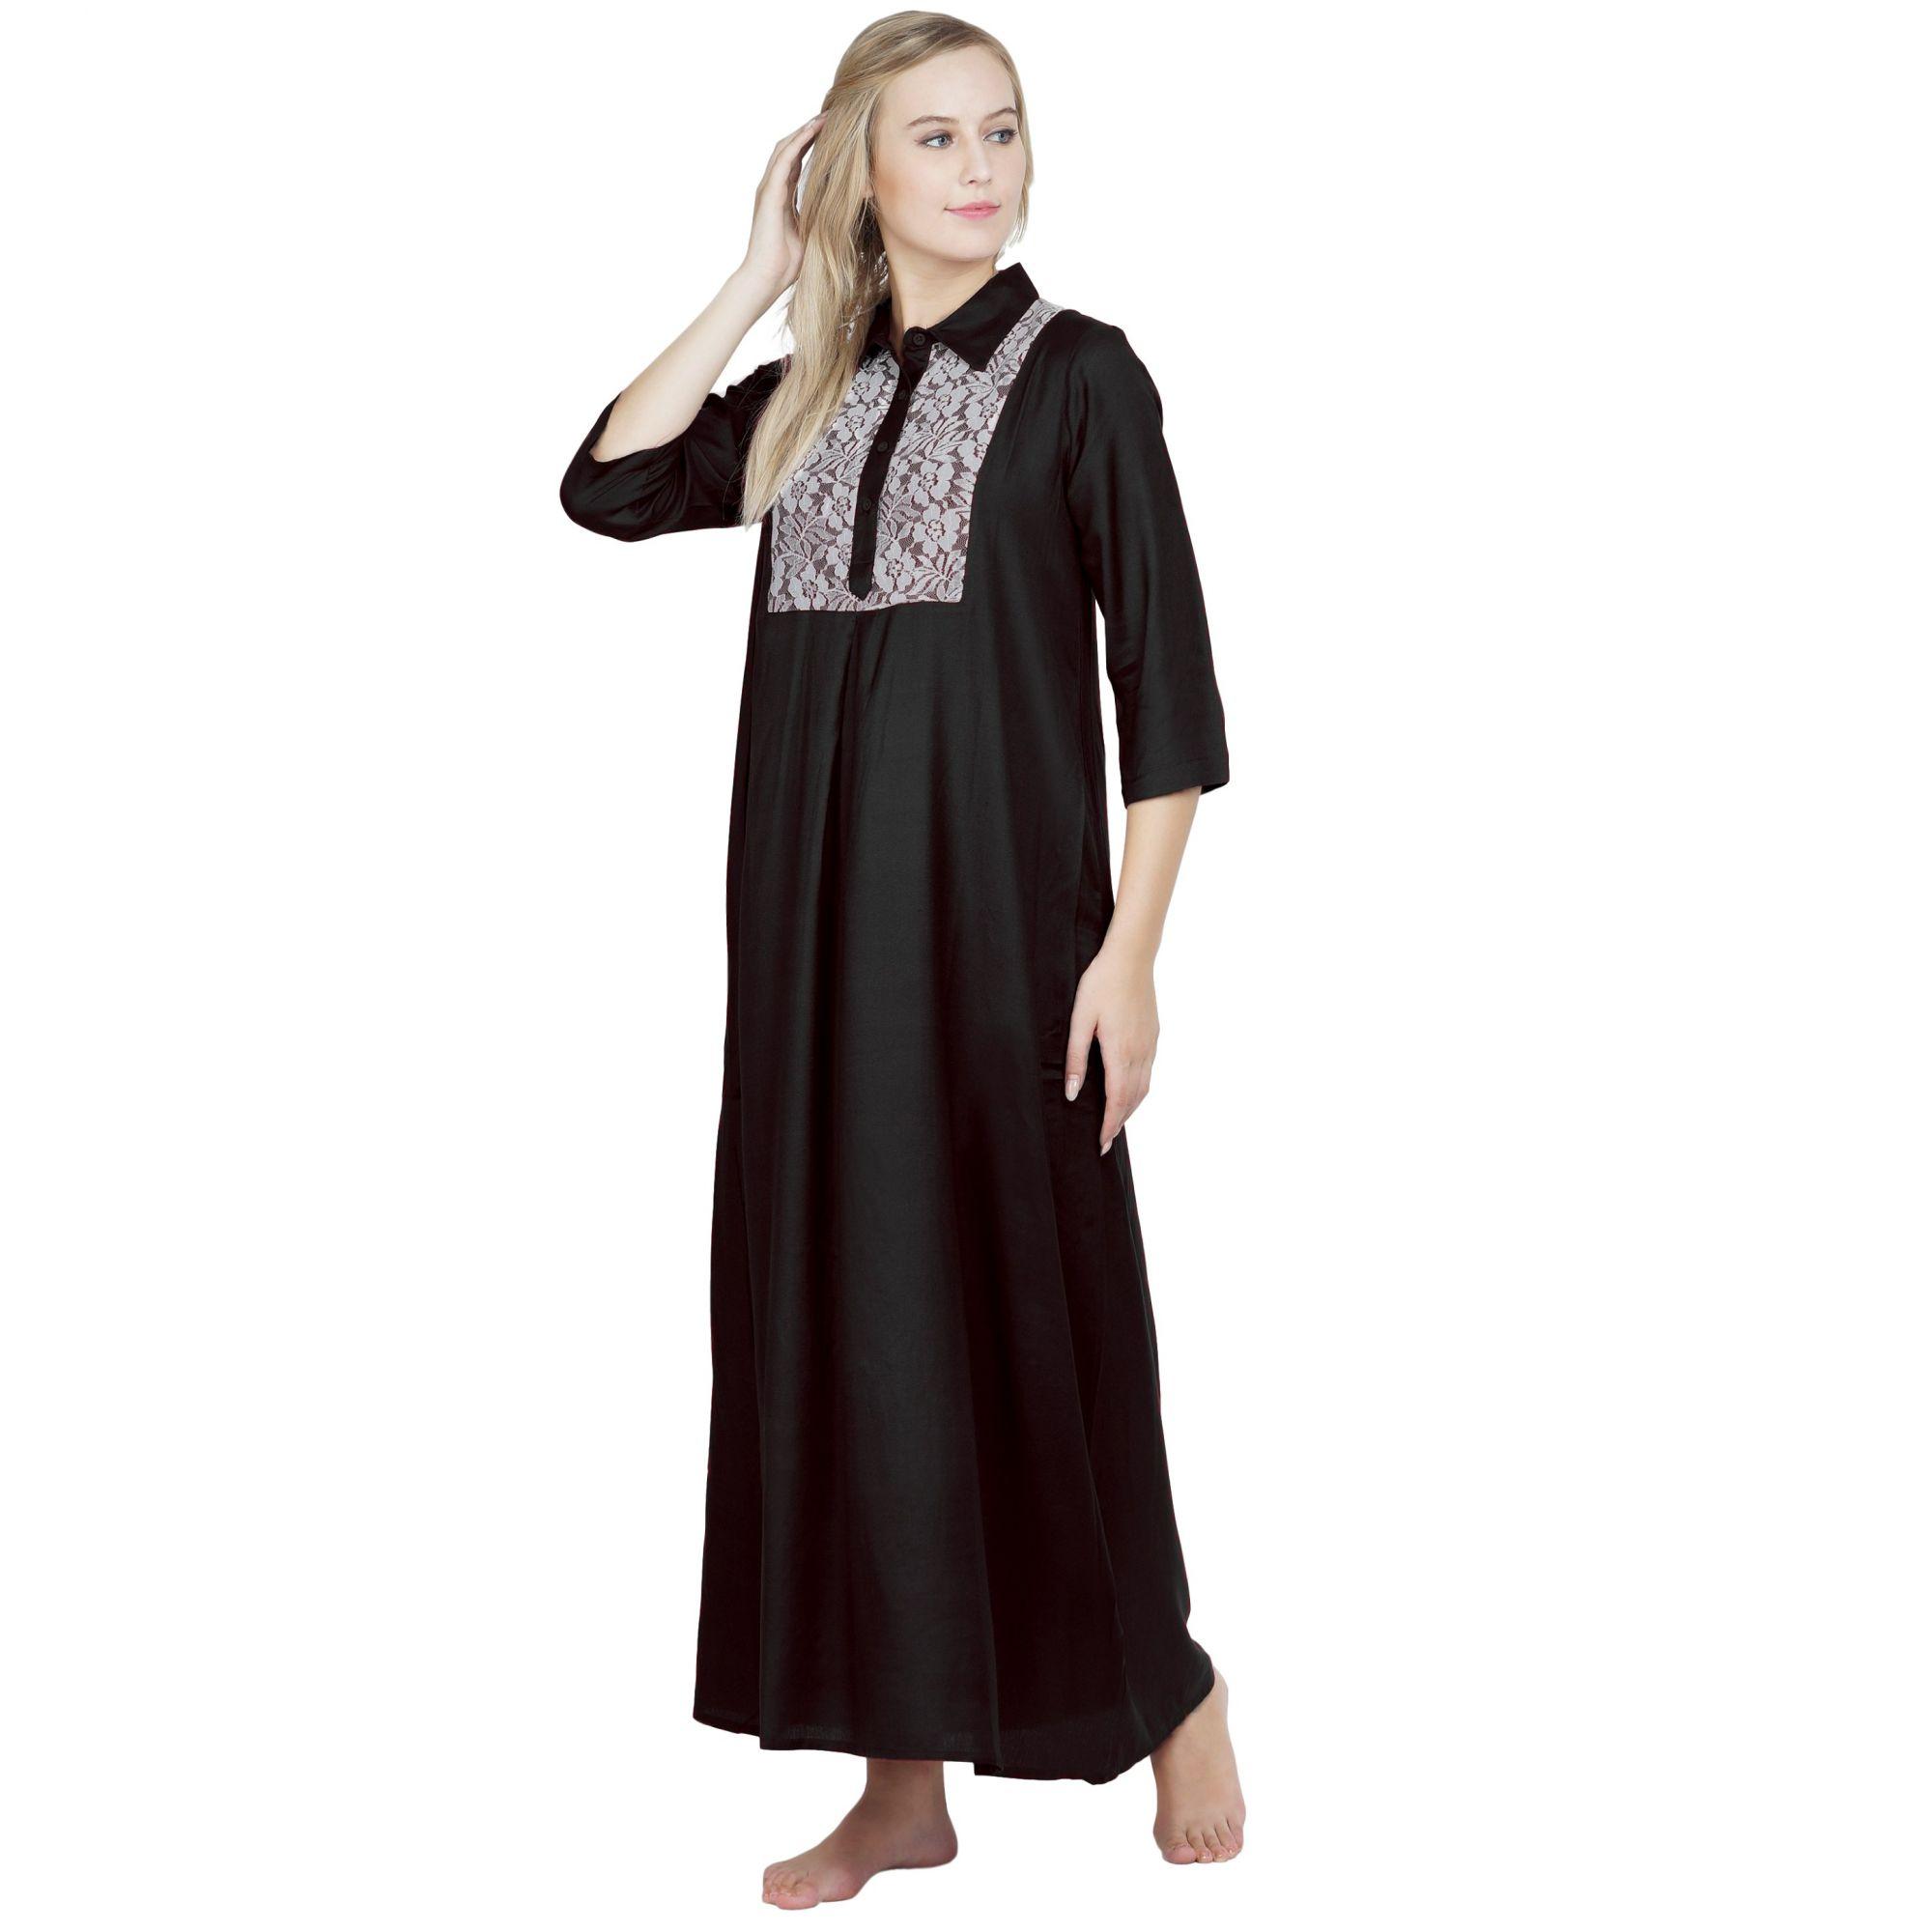 Stylish Lace Bodice Shirtdress Maxi Nighty Gown in Black